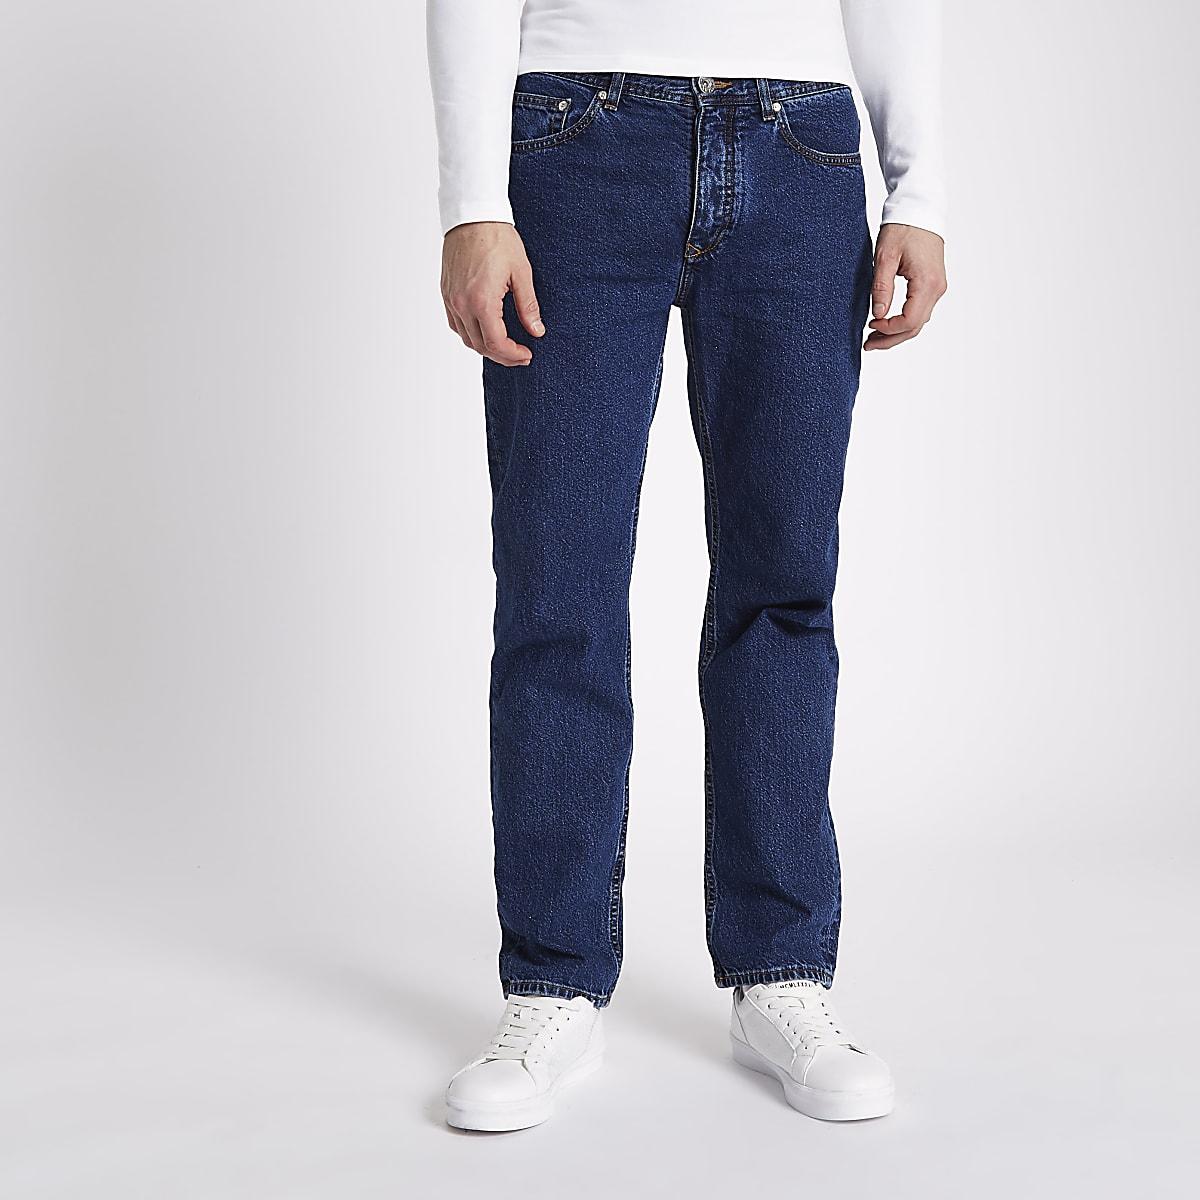 Dark blue Dean standard jeans